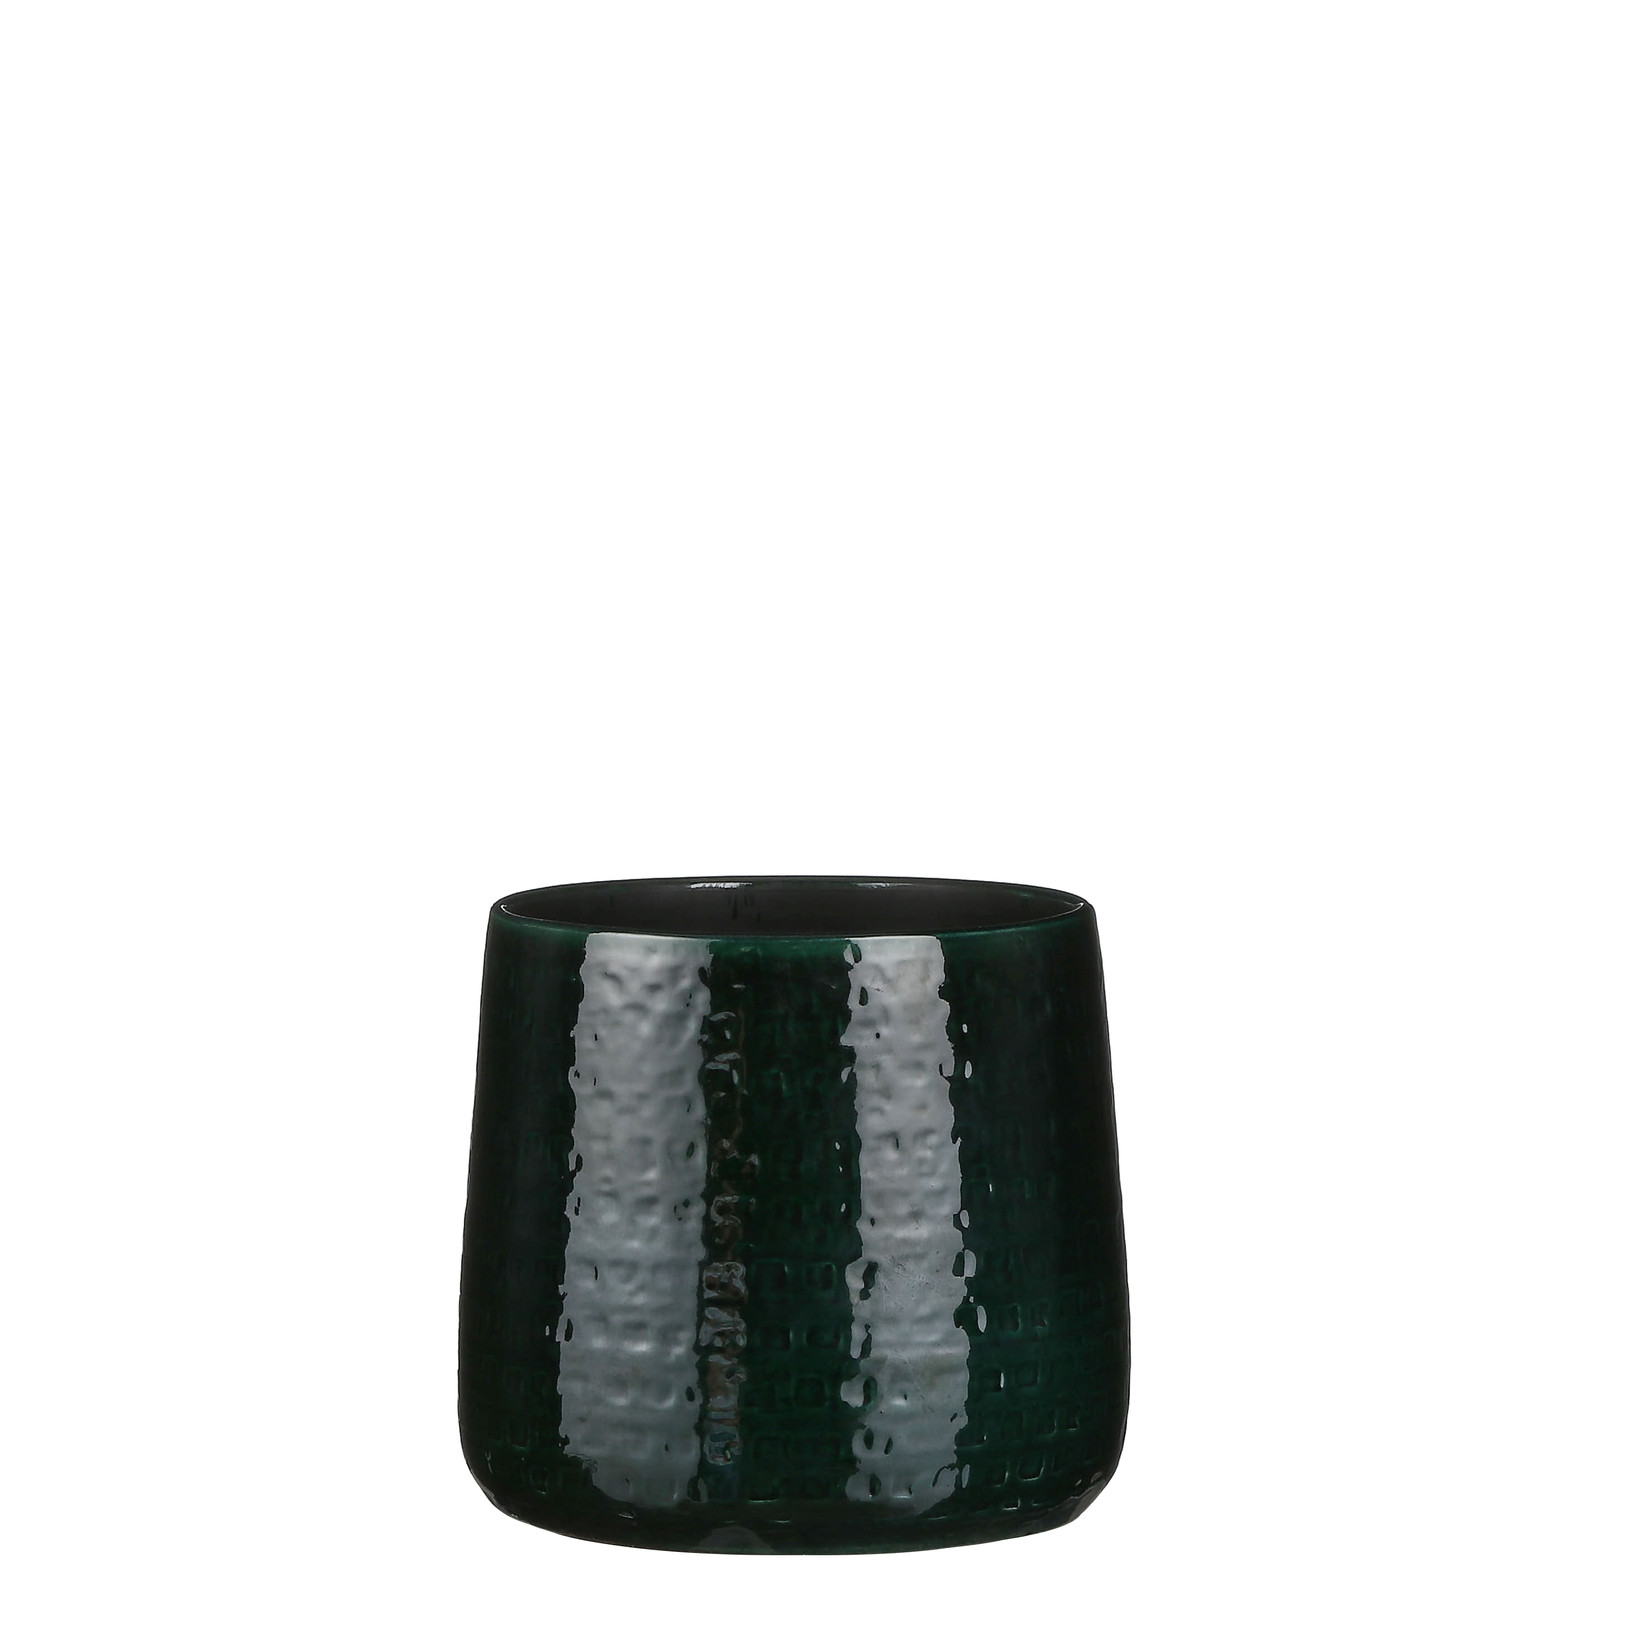 MiCa 1060627 Floyd pot around green